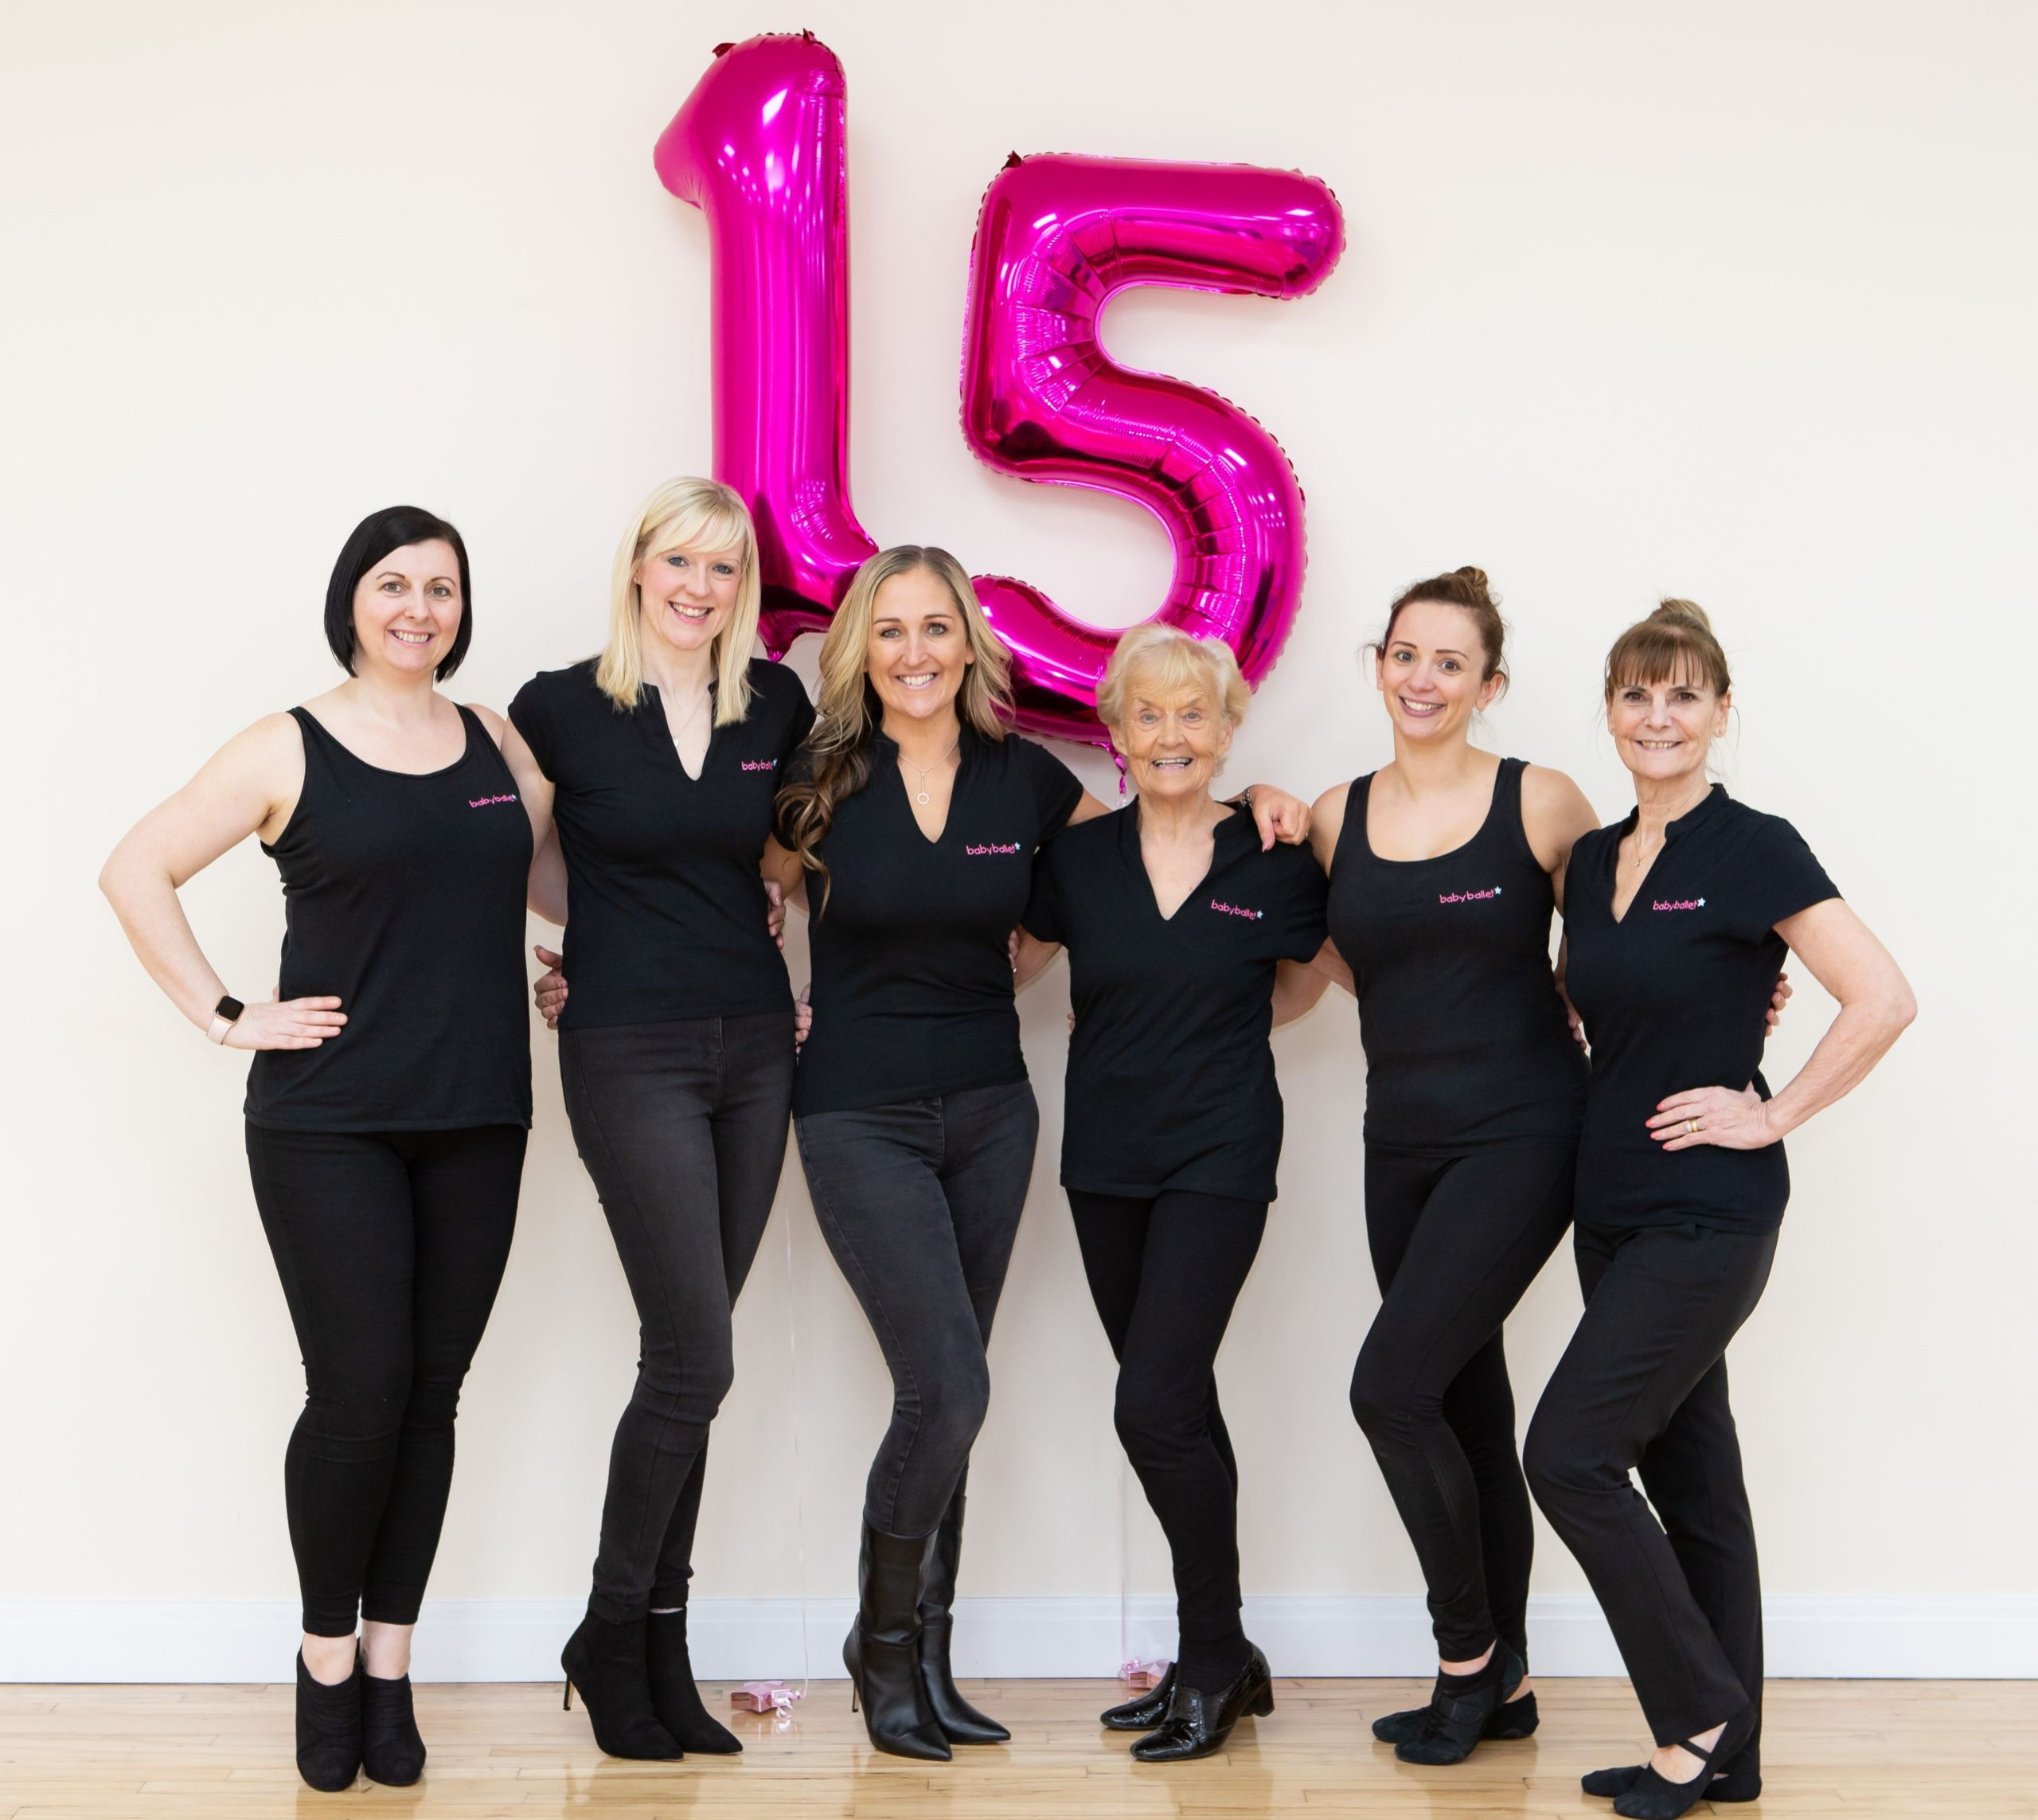 babyballet celebrates 15 years